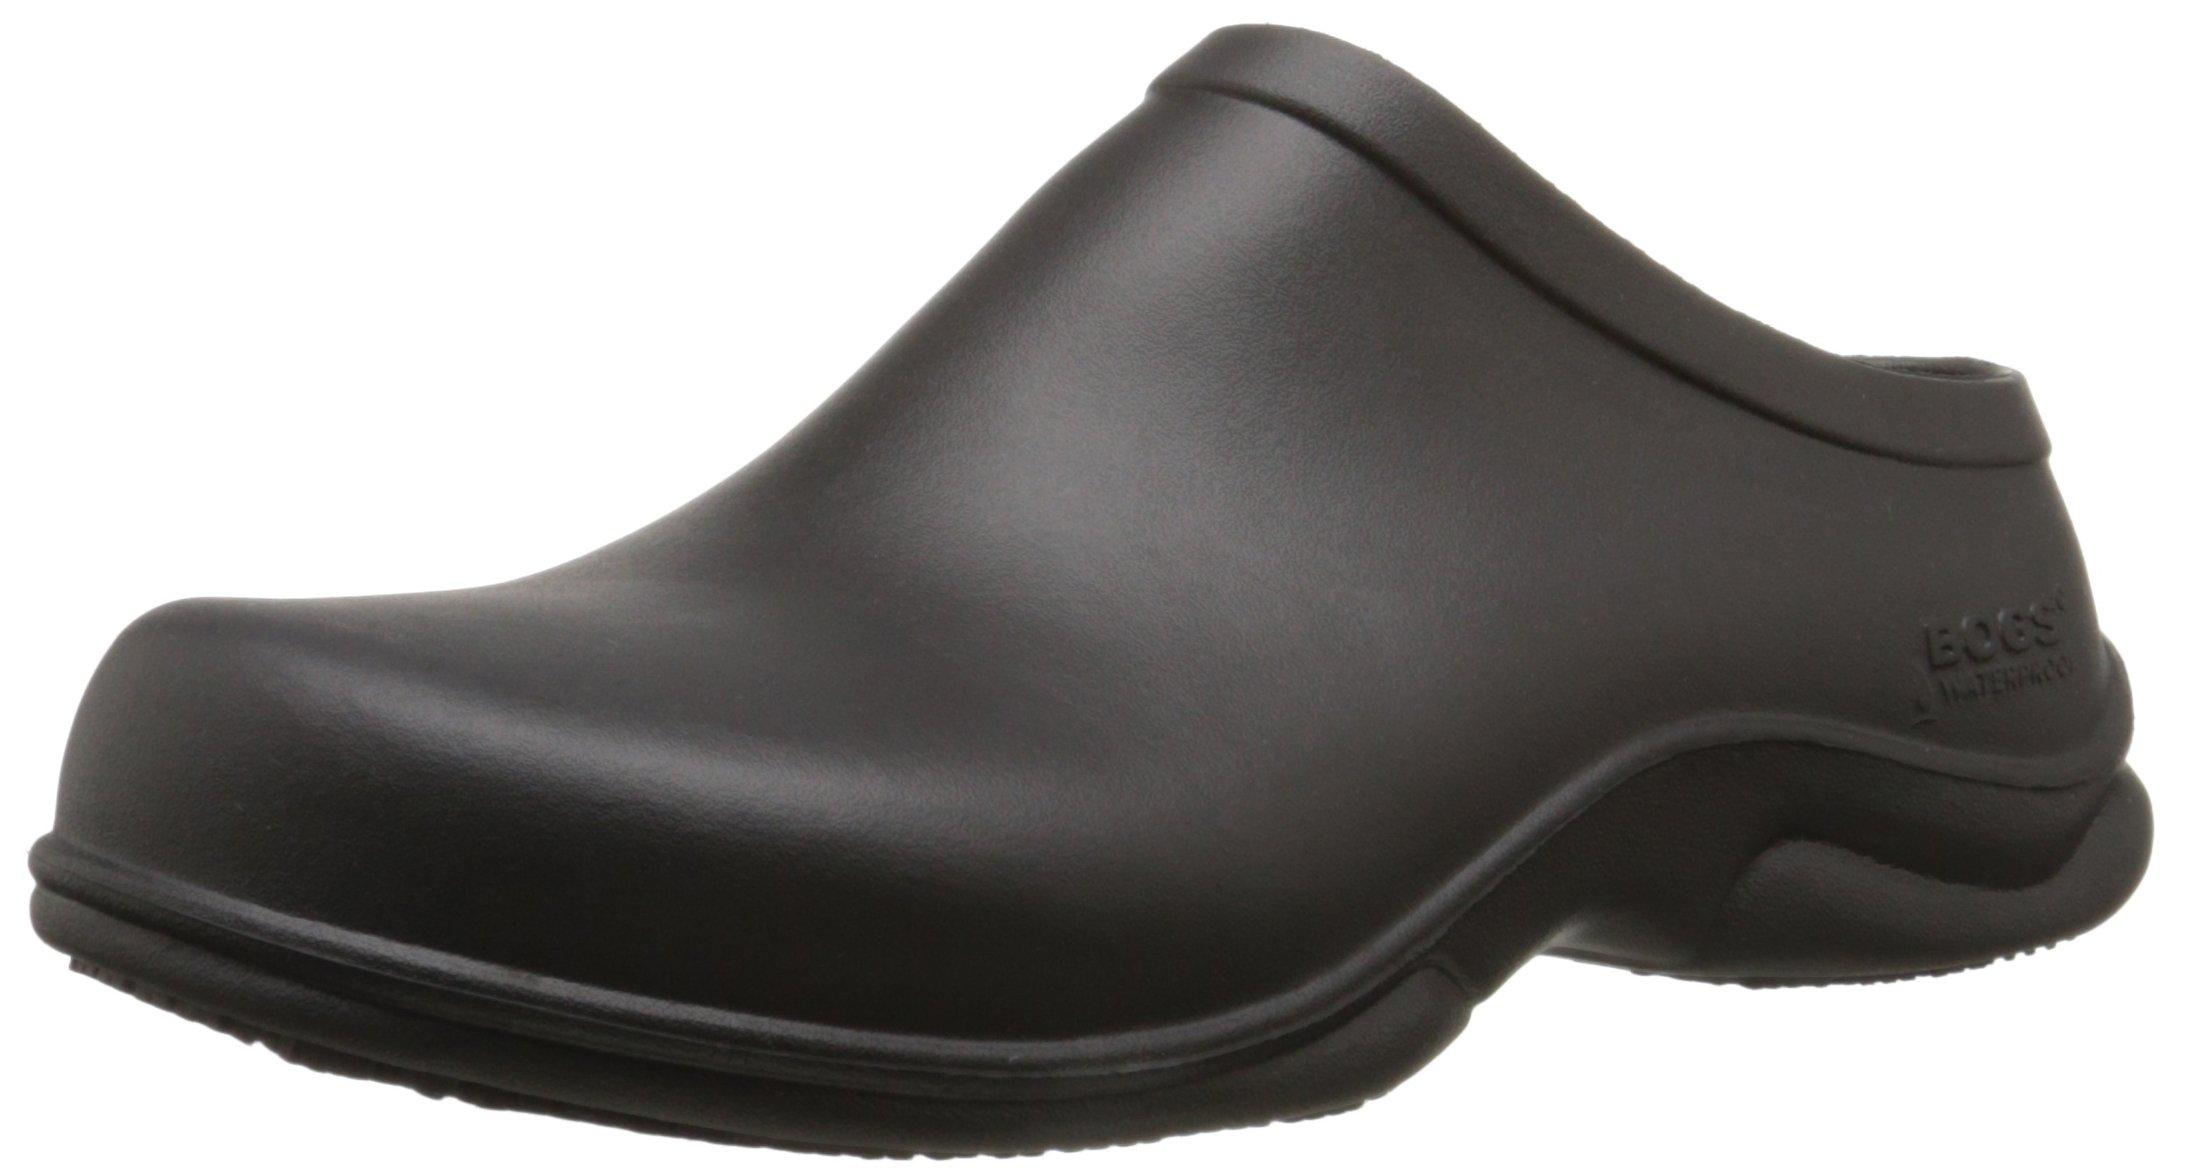 Bogs Men's Stewart Slip Resistant Work Shoe, Black, 10 M US by BOGS